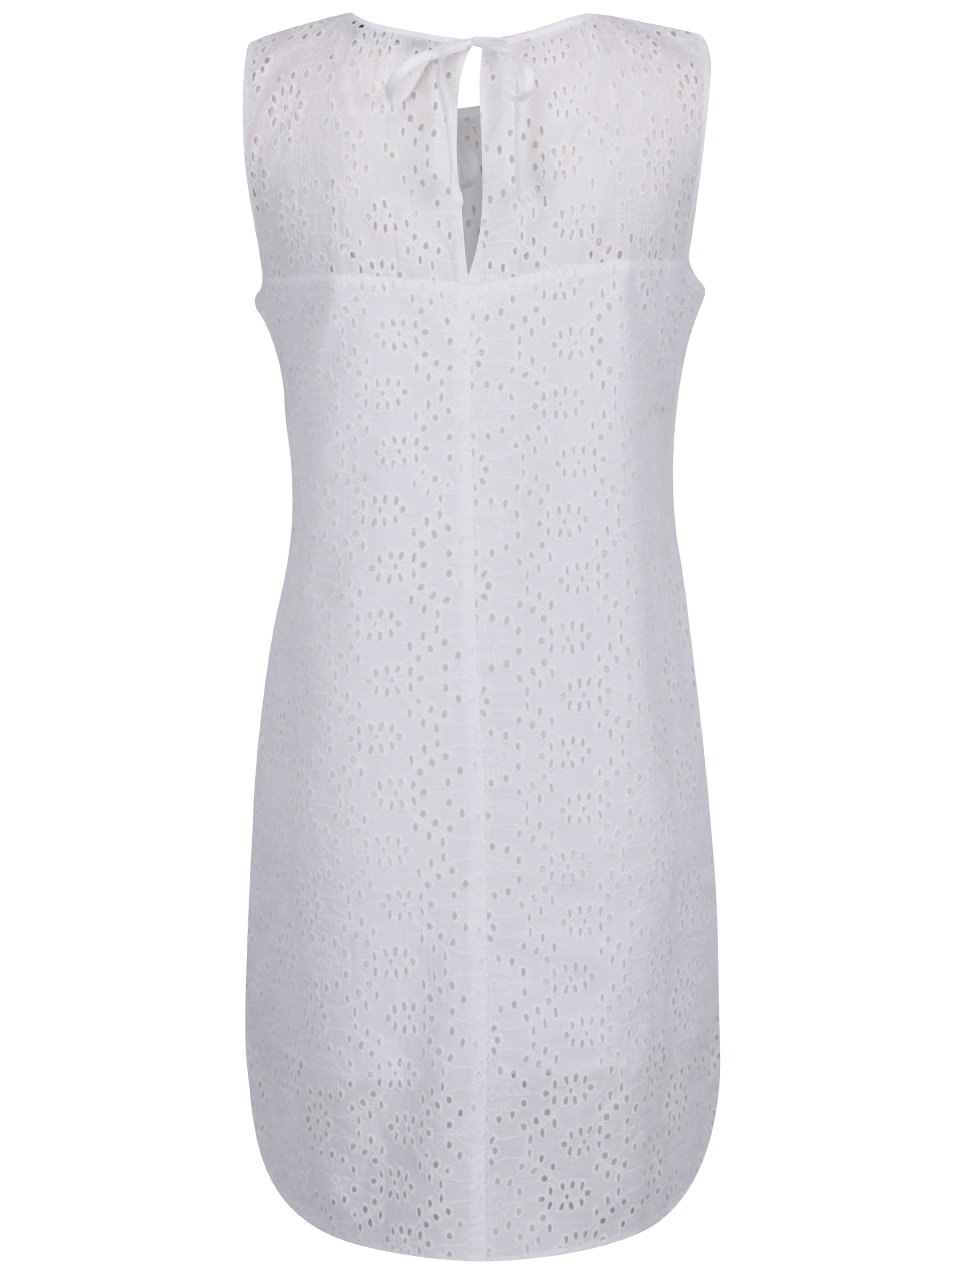 Biele šaty bez rukávov s madeirou Dorothy Perkins ... b48ecebcace